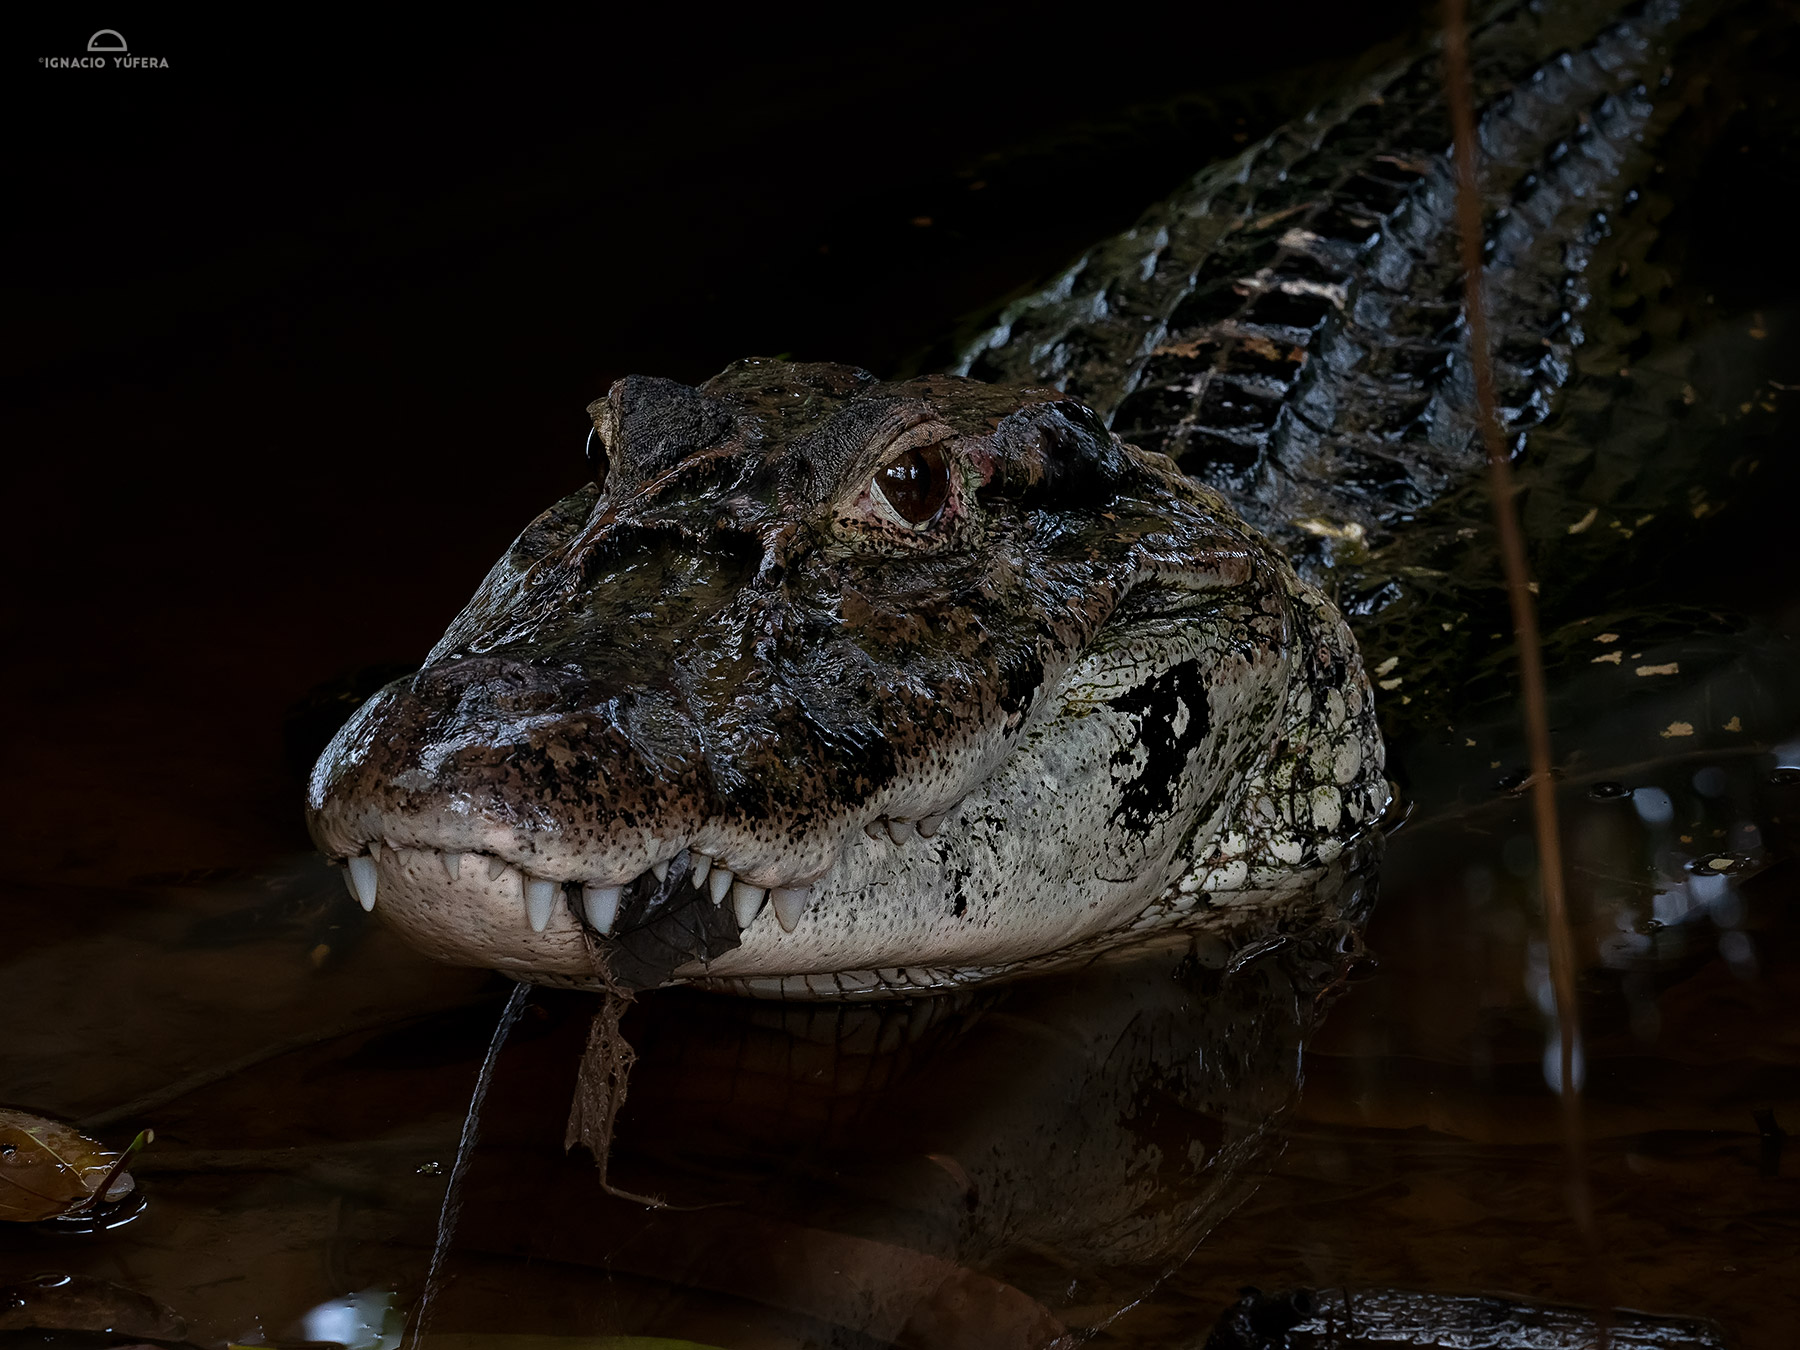 Black Caiman (Melanosuchus niger), Yasuní National Park, Ecuador